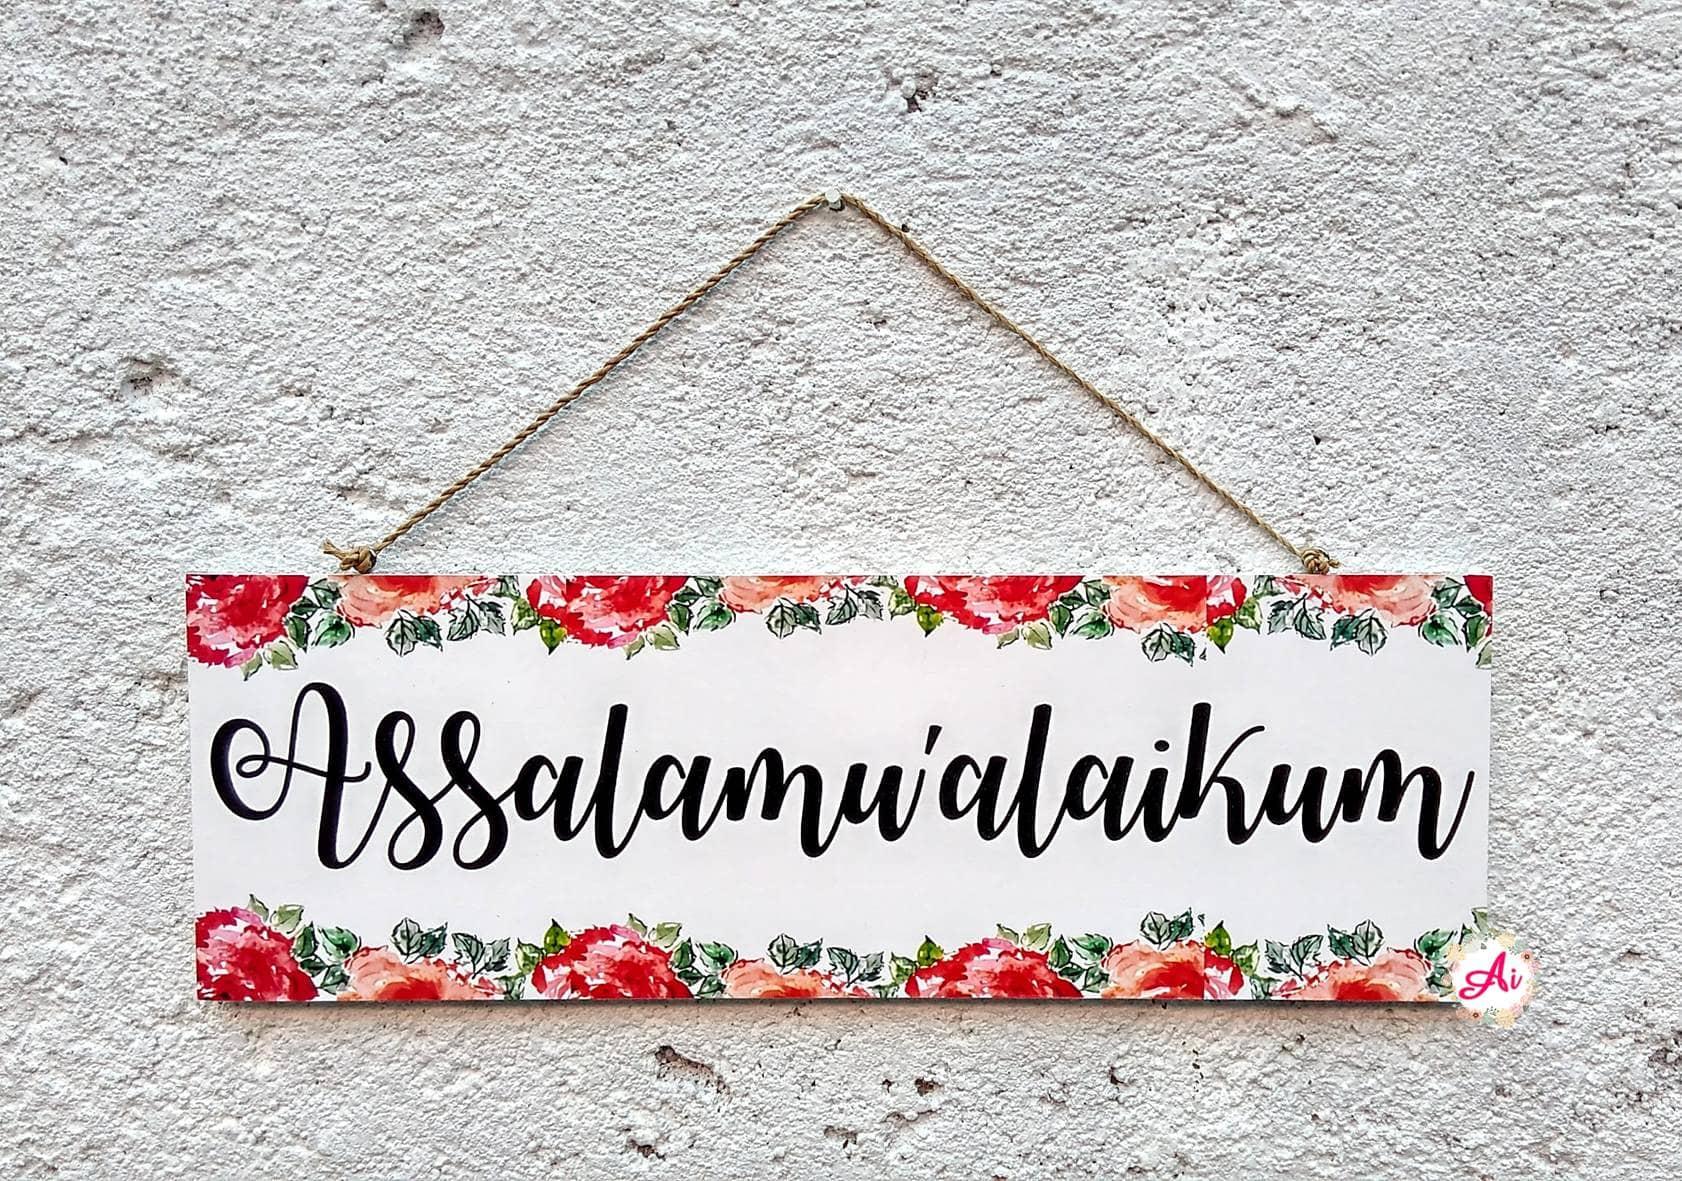 Jual Produk Ukm Dekorasi Rumah L Wall Decor Hiasan Dinding Bumn Travel Bag Small Size Shabby Chic Assalamualaikum 11